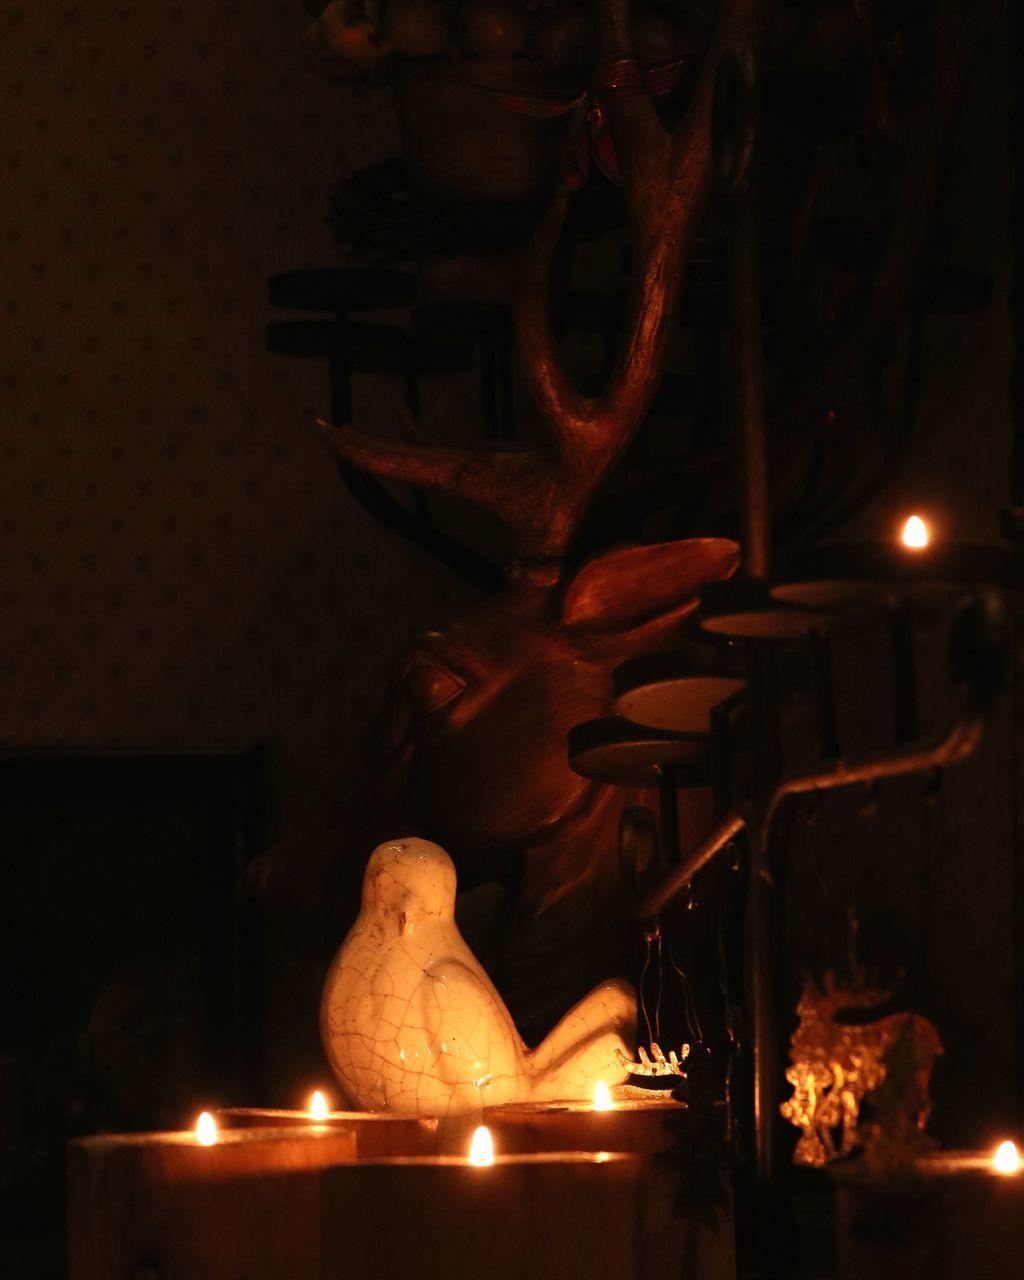 night, flame, burning, statue, illuminated, sculpture, indoors, heat - temperature, no people, christmas decoration, close-up, carousel